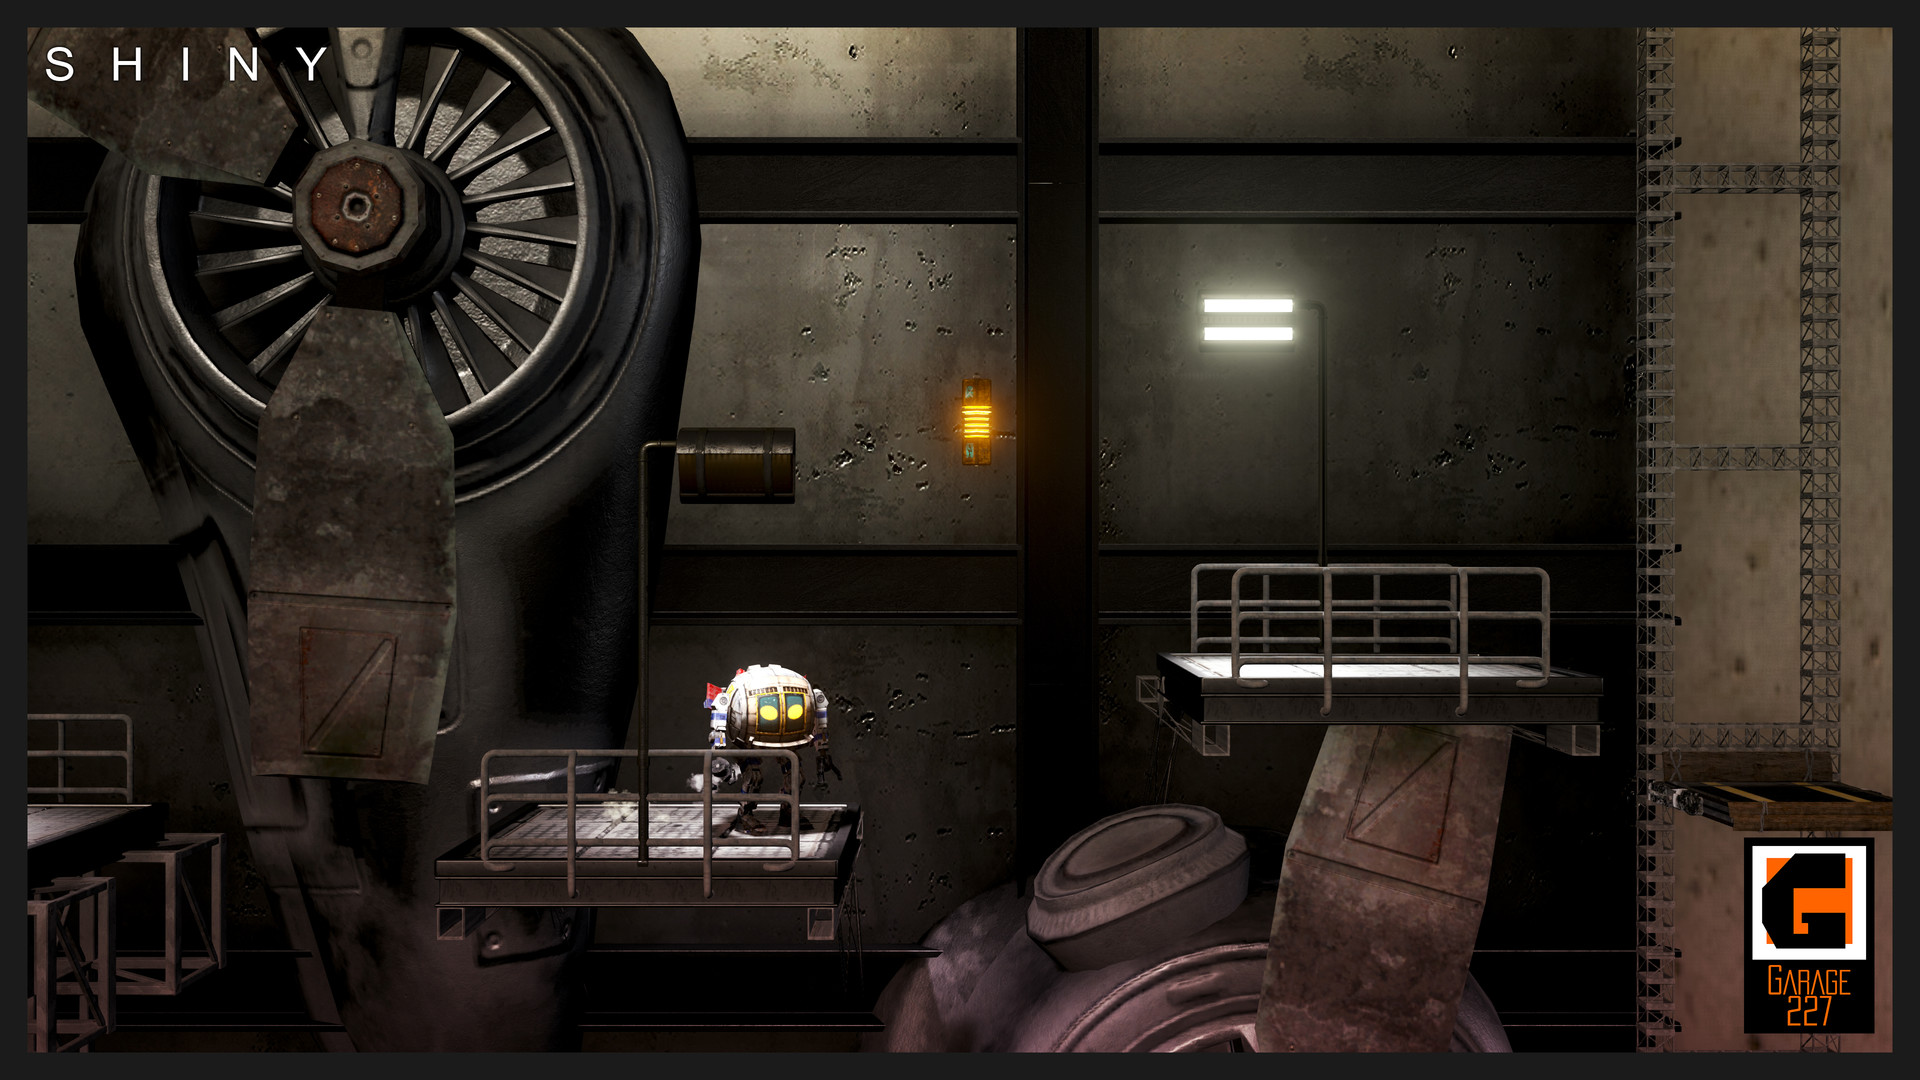 shiny-pc-screenshot-04